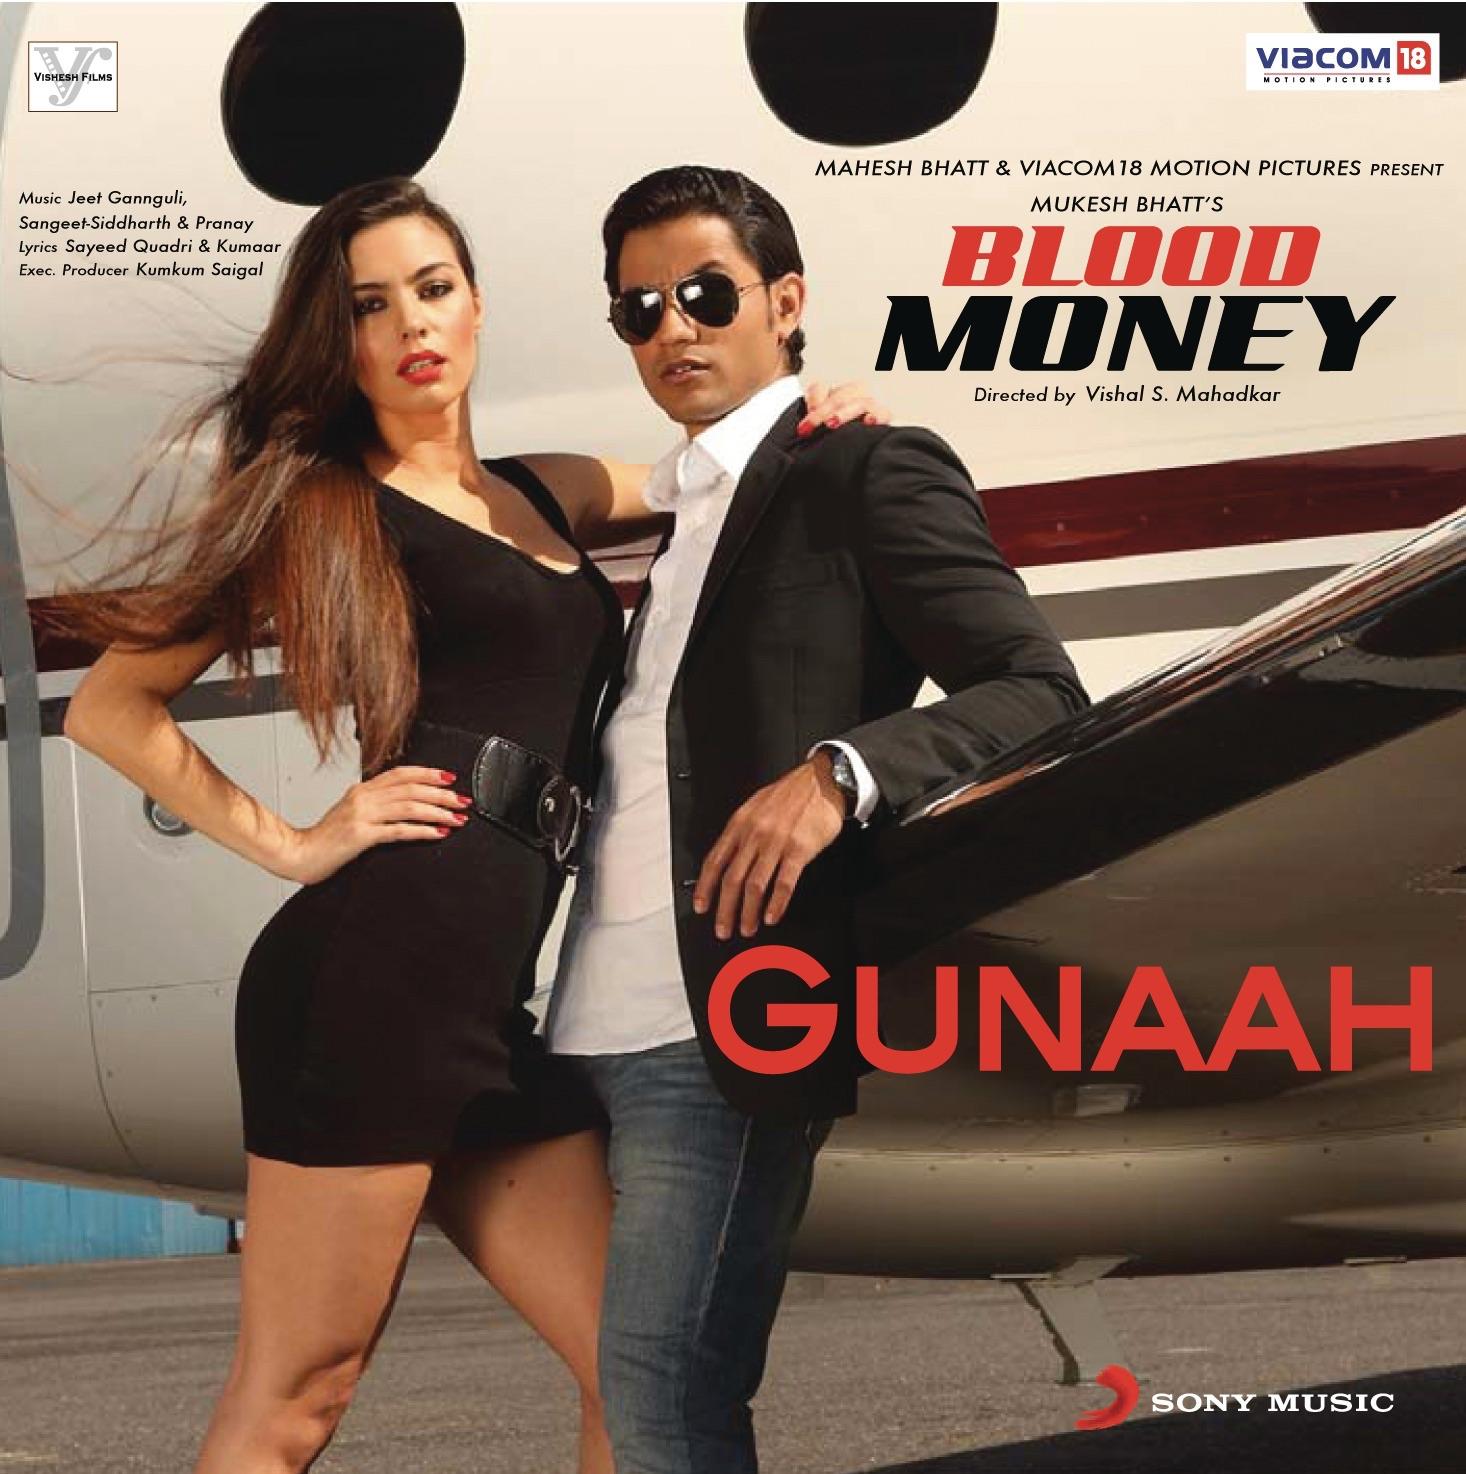 Karachi Song Download: Gunaah Movie Songs Pk Free Download